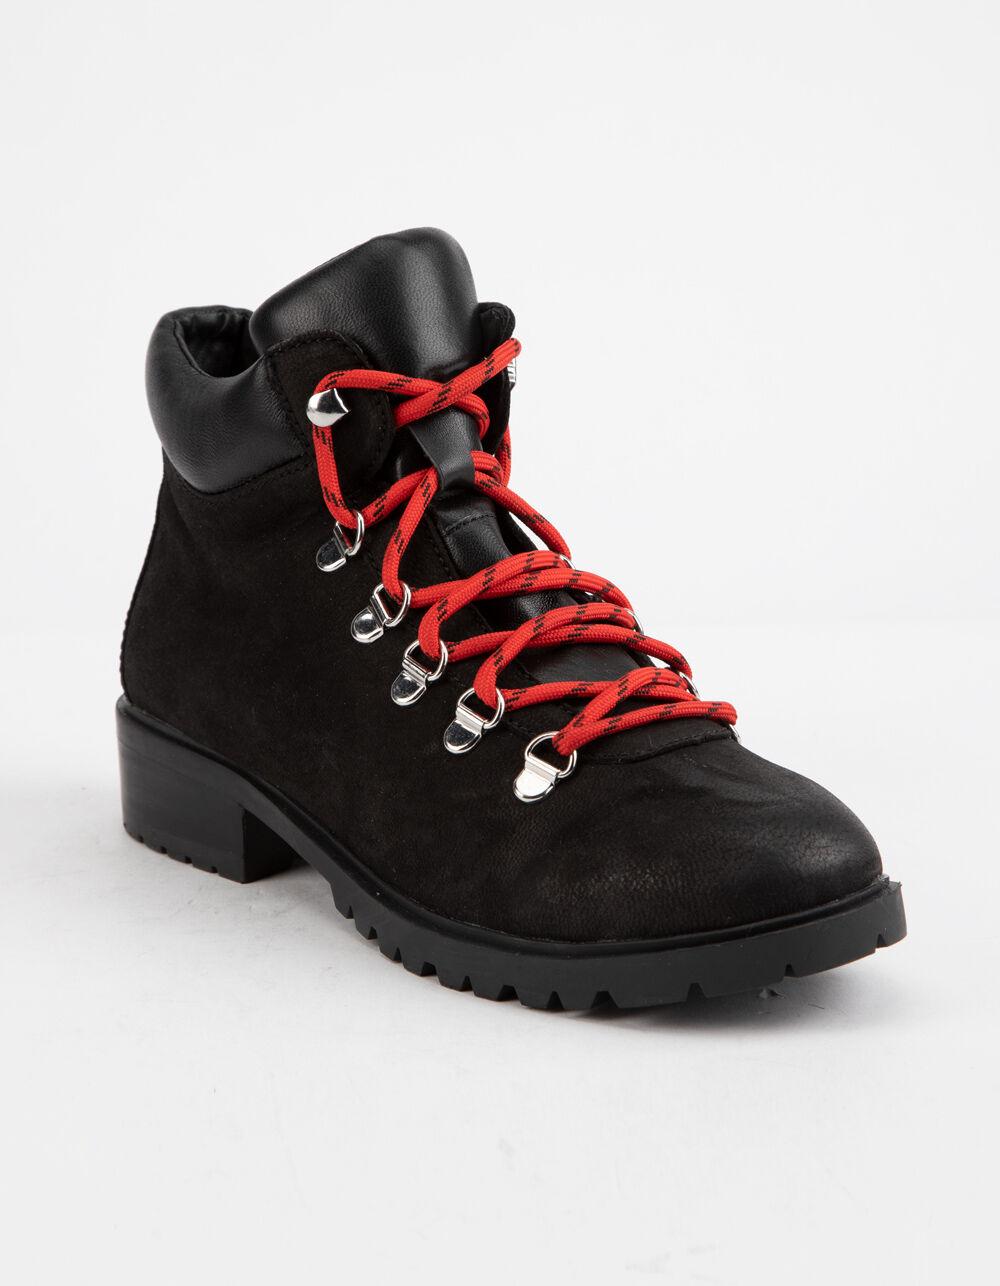 STEVE MADDEN Lora Black Patent Combat Boots